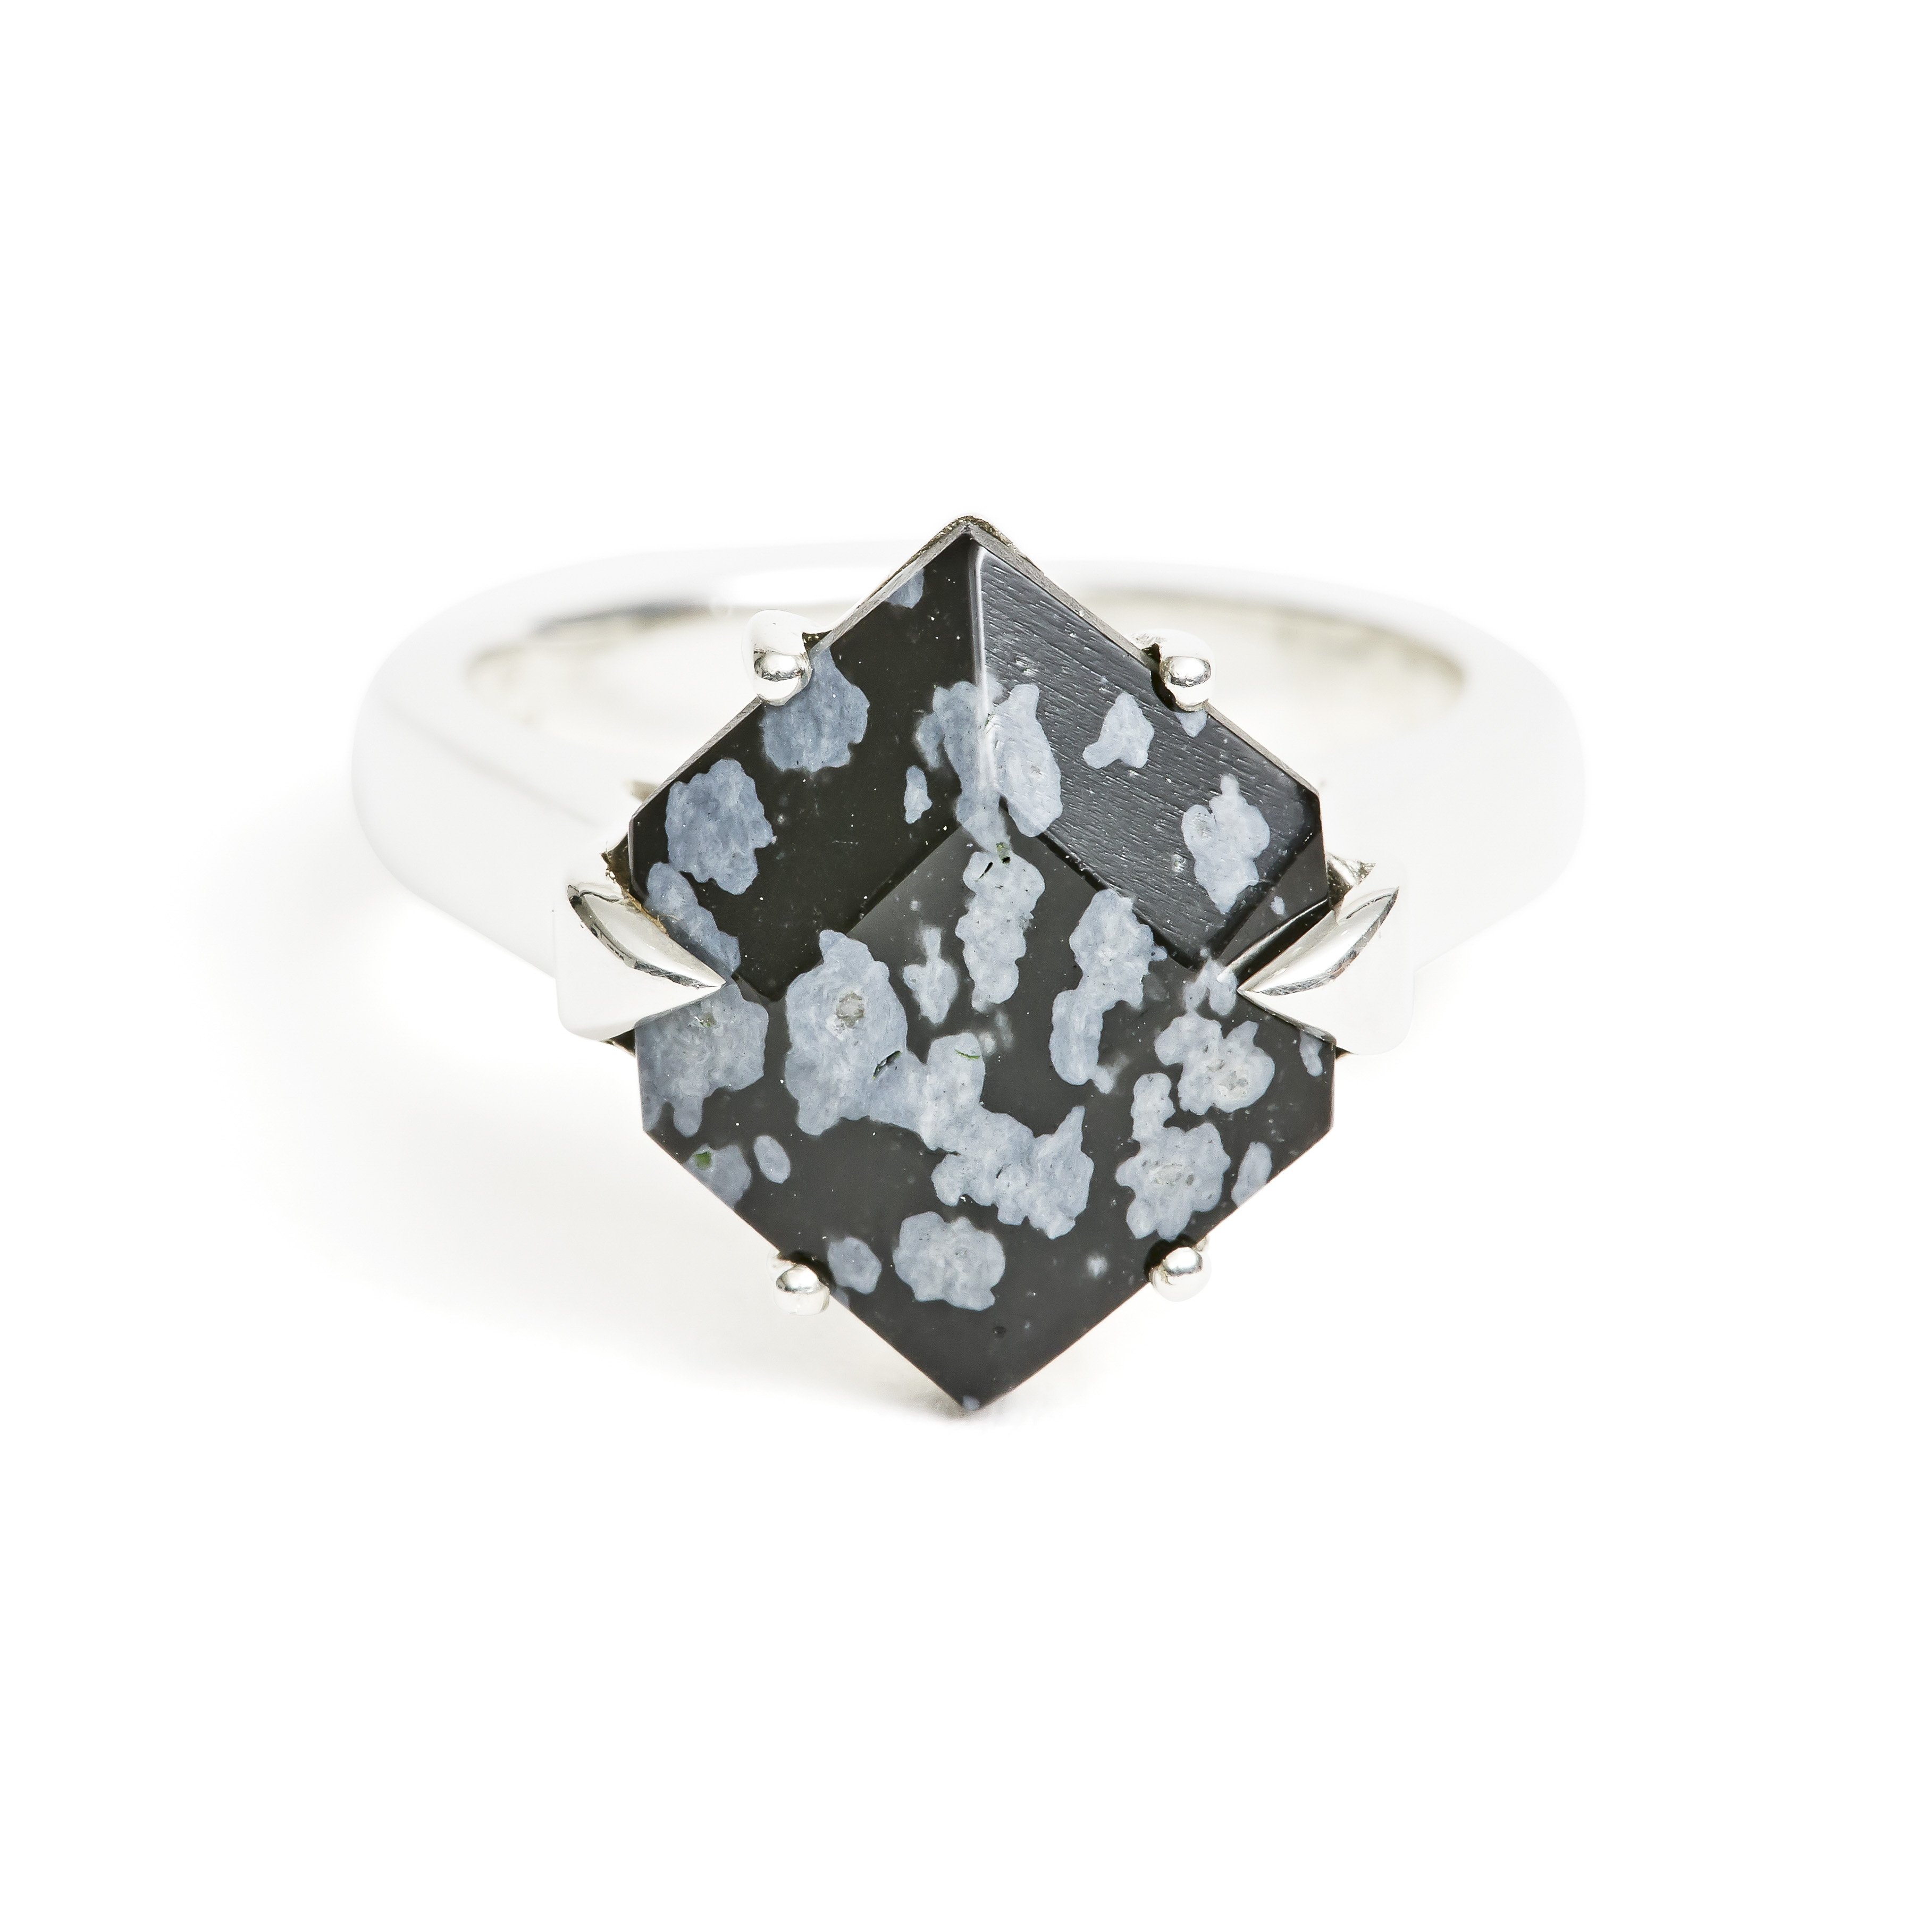 obsidian-silver-ring-1